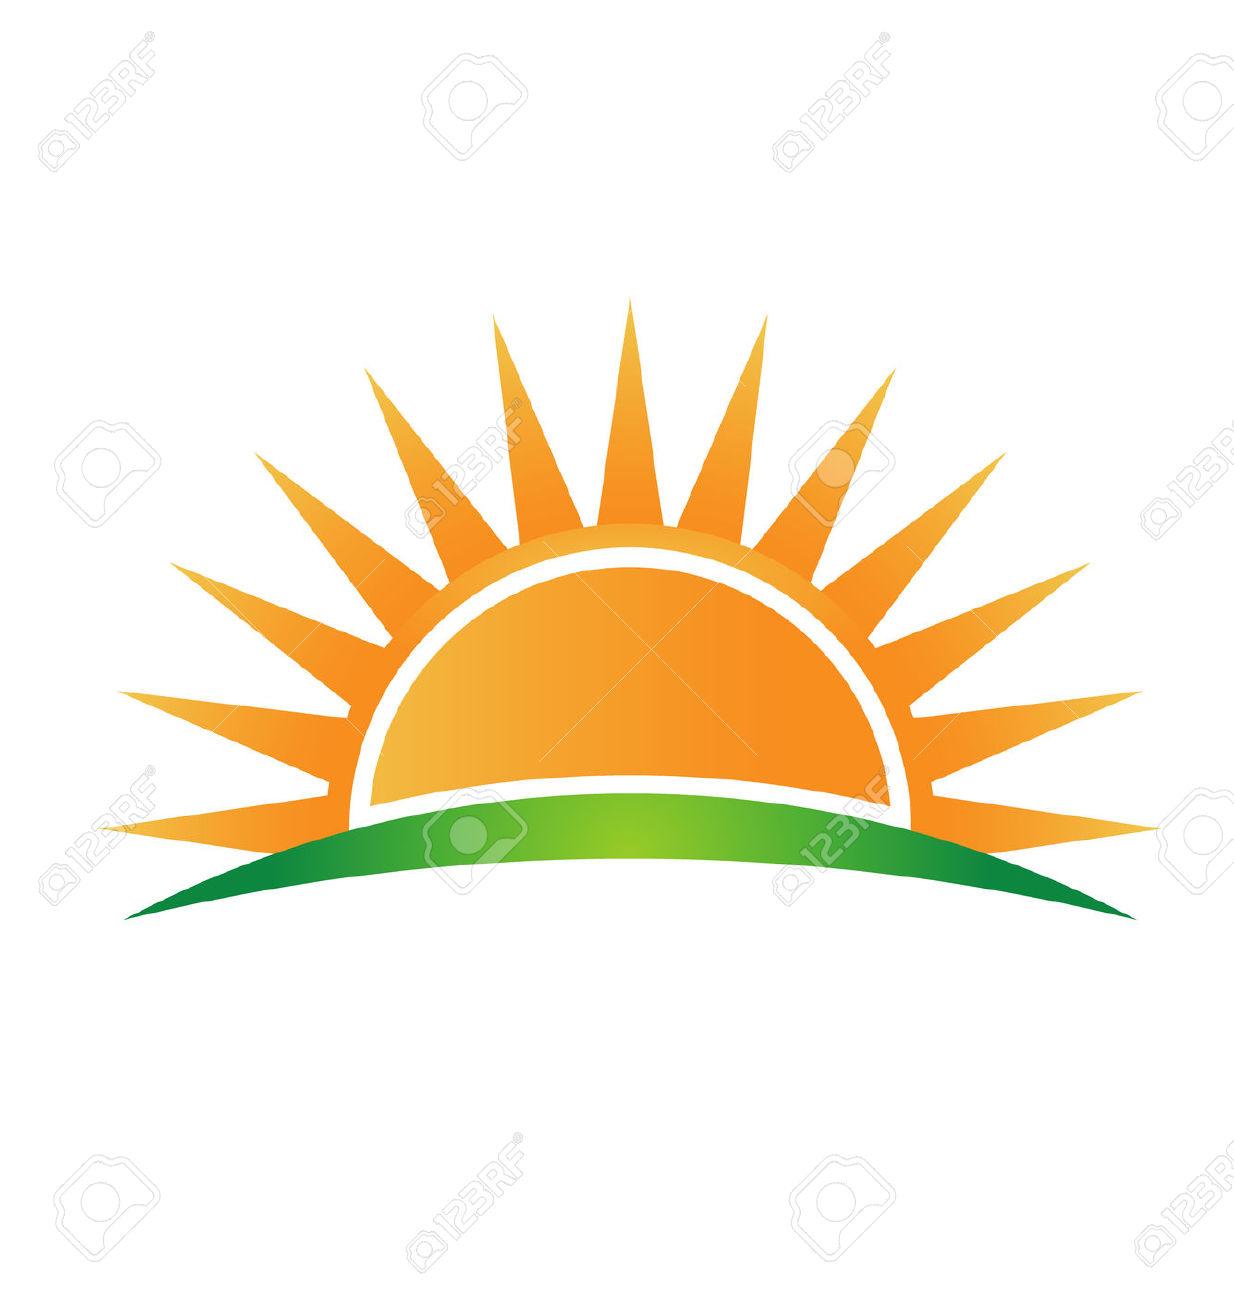 hight resolution of 1234x1300 sun clipart sunrise